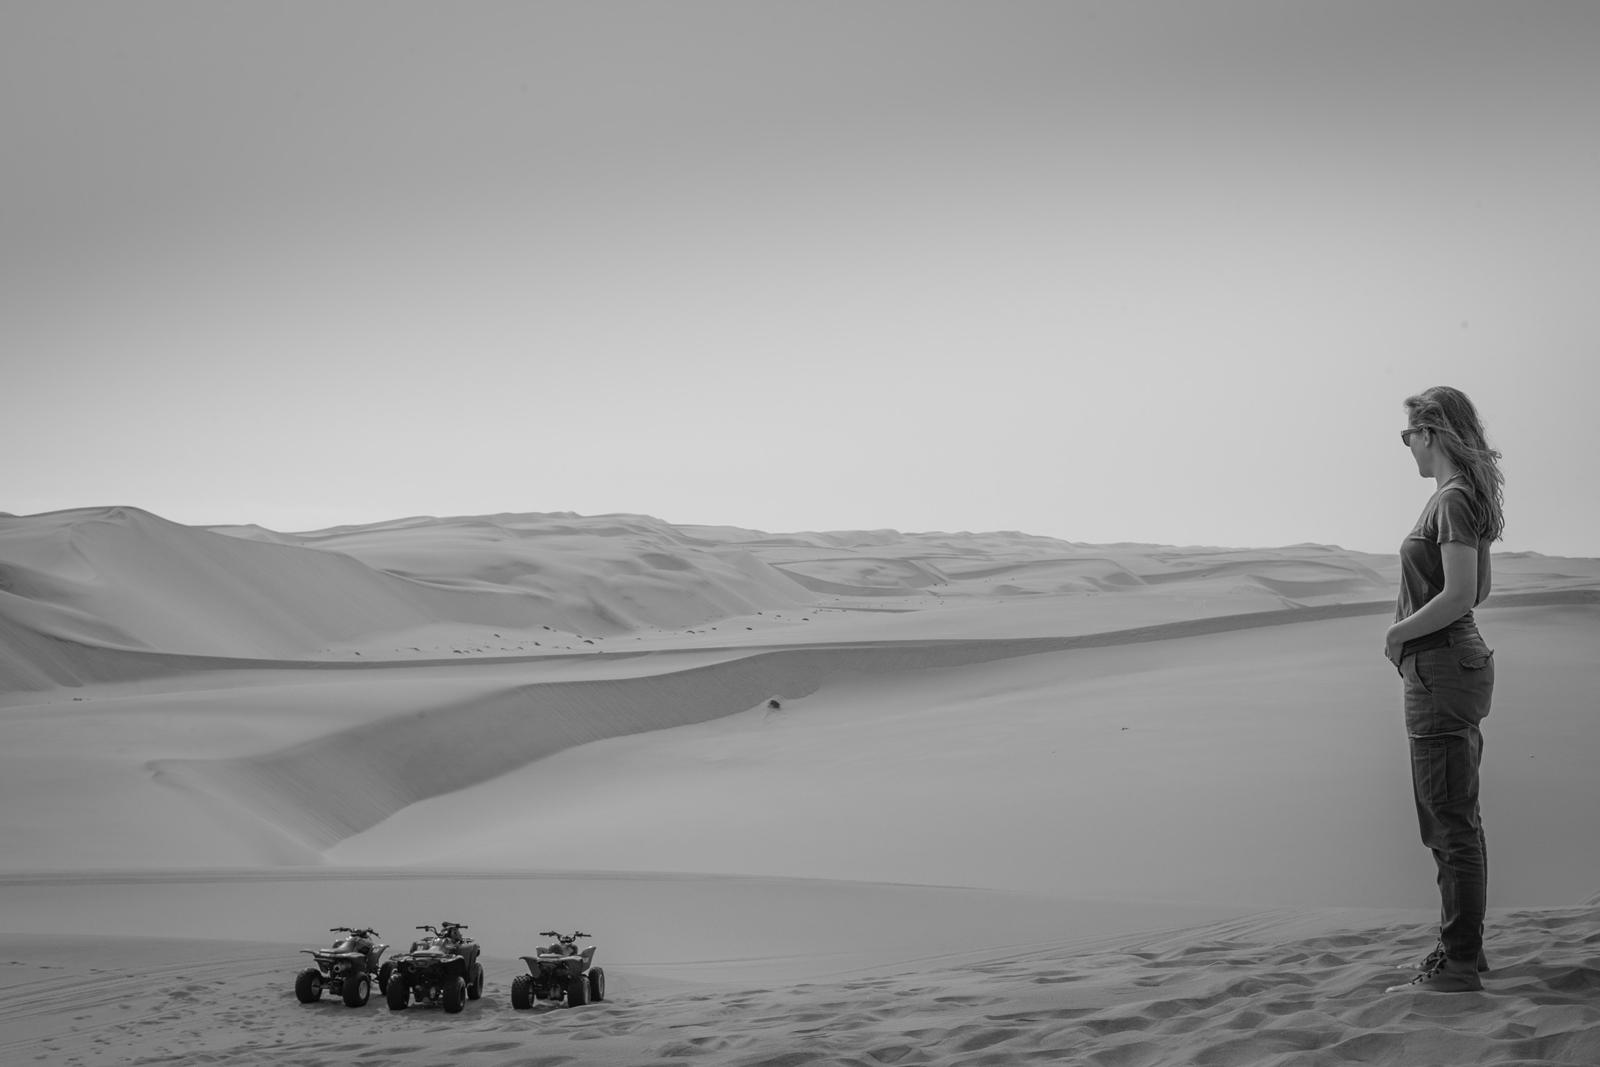 Quadbiking near Namibia's adventure capital, Swakopmund